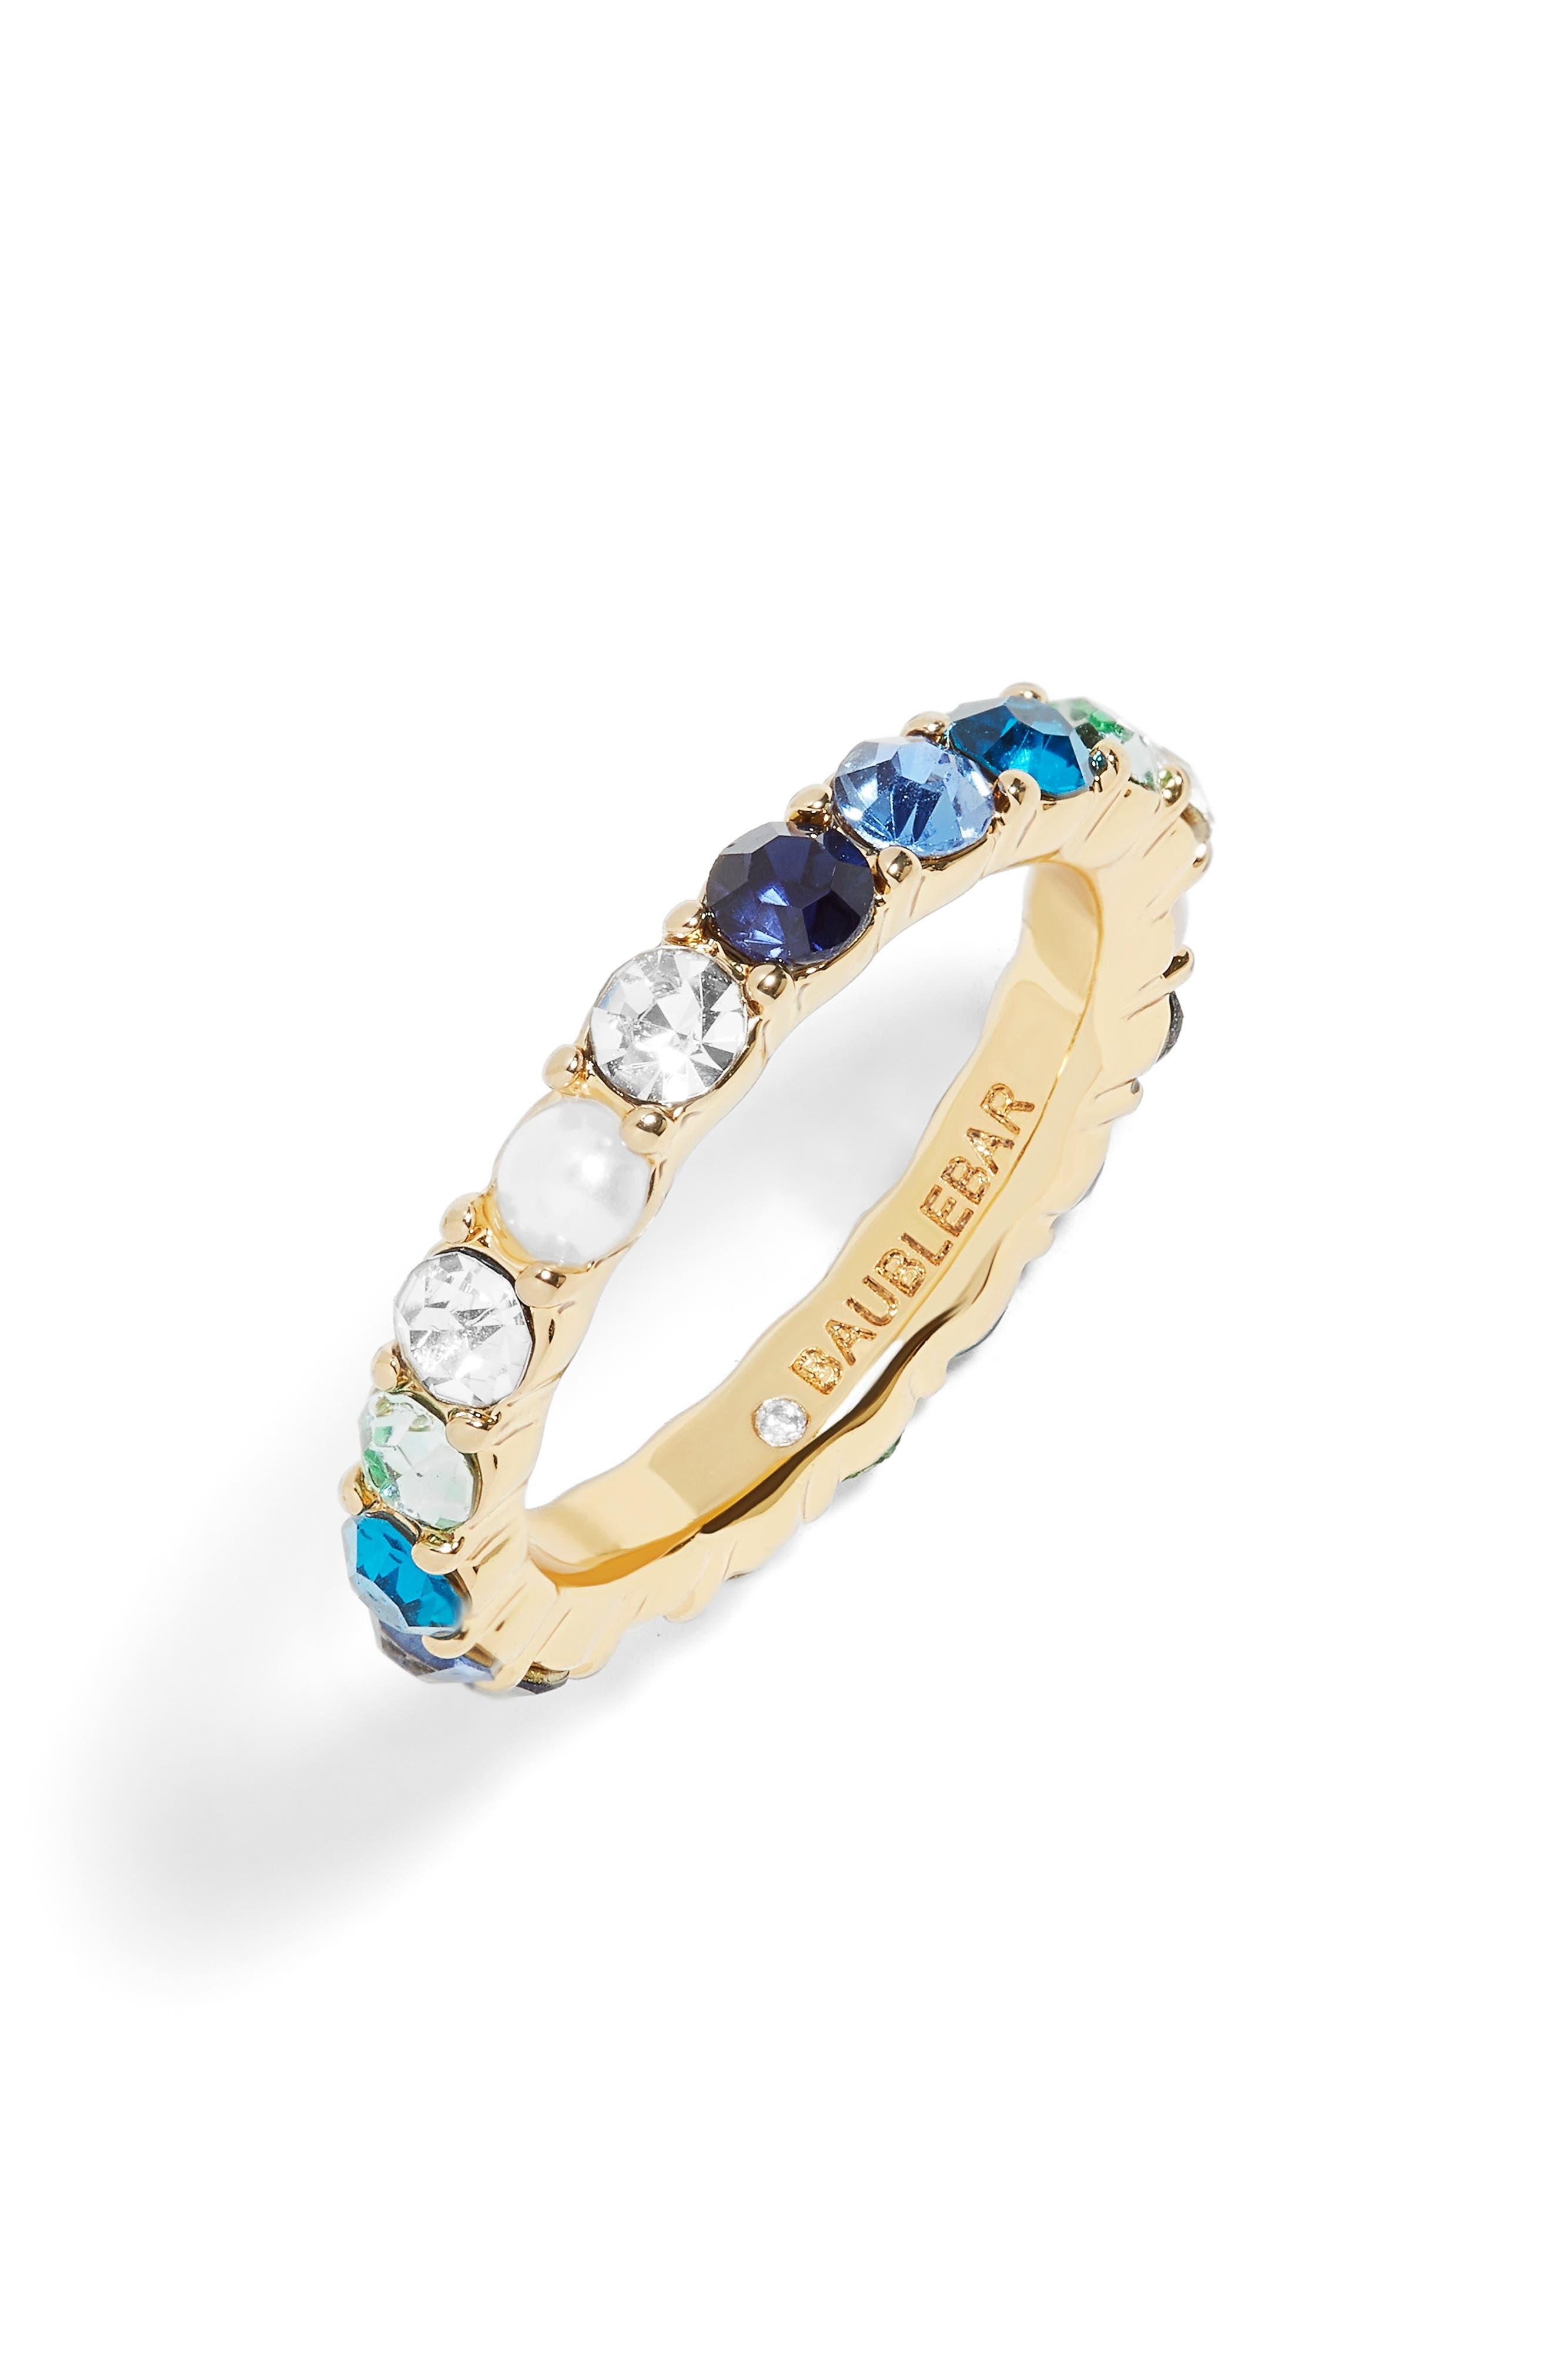 x Micaela Erlanger 7 Days a Week Eternity Ring,                         Main,                         color, BLUE/ GOLD